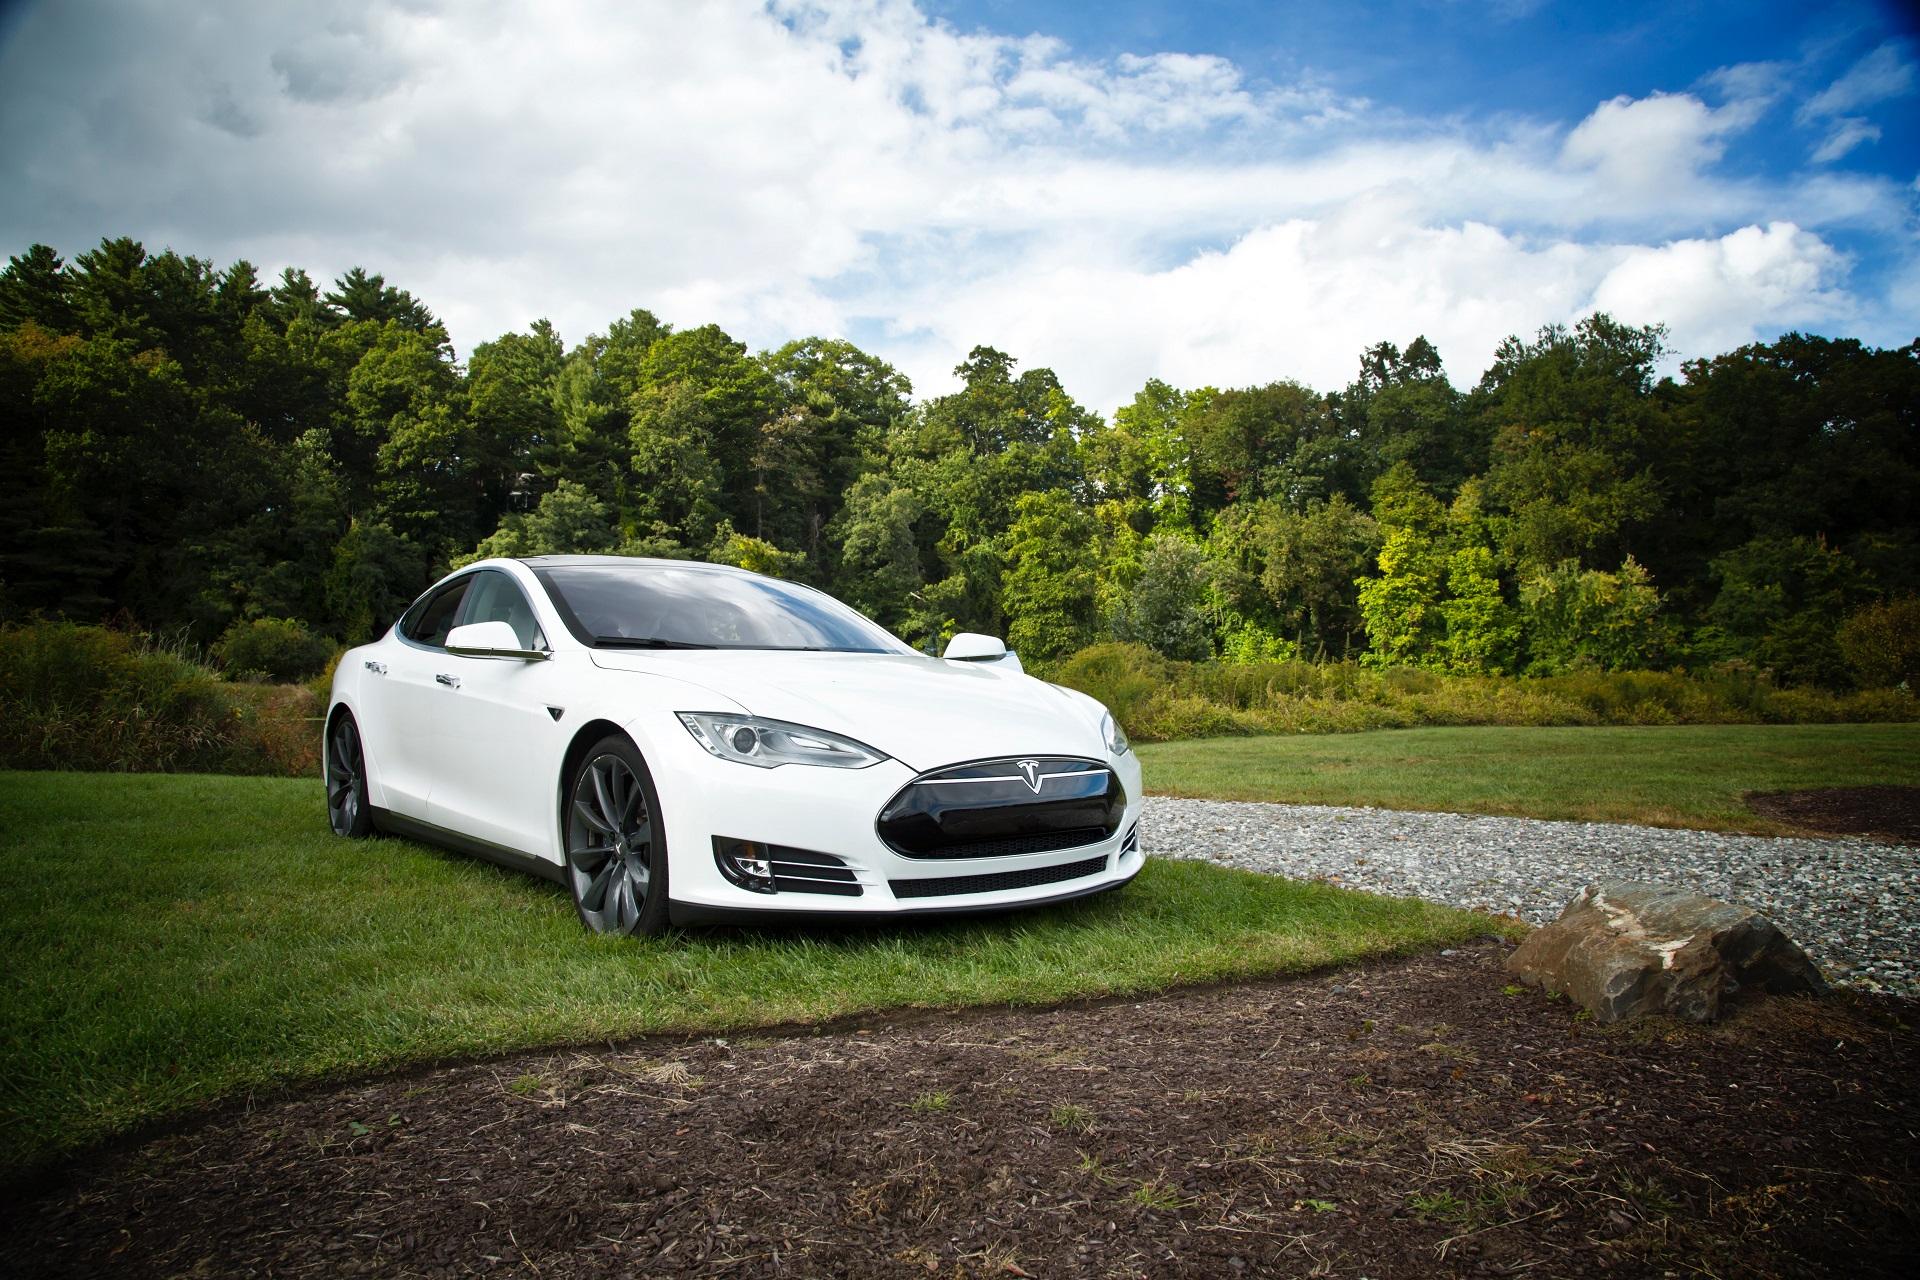 Voiture Tesla, design industriel